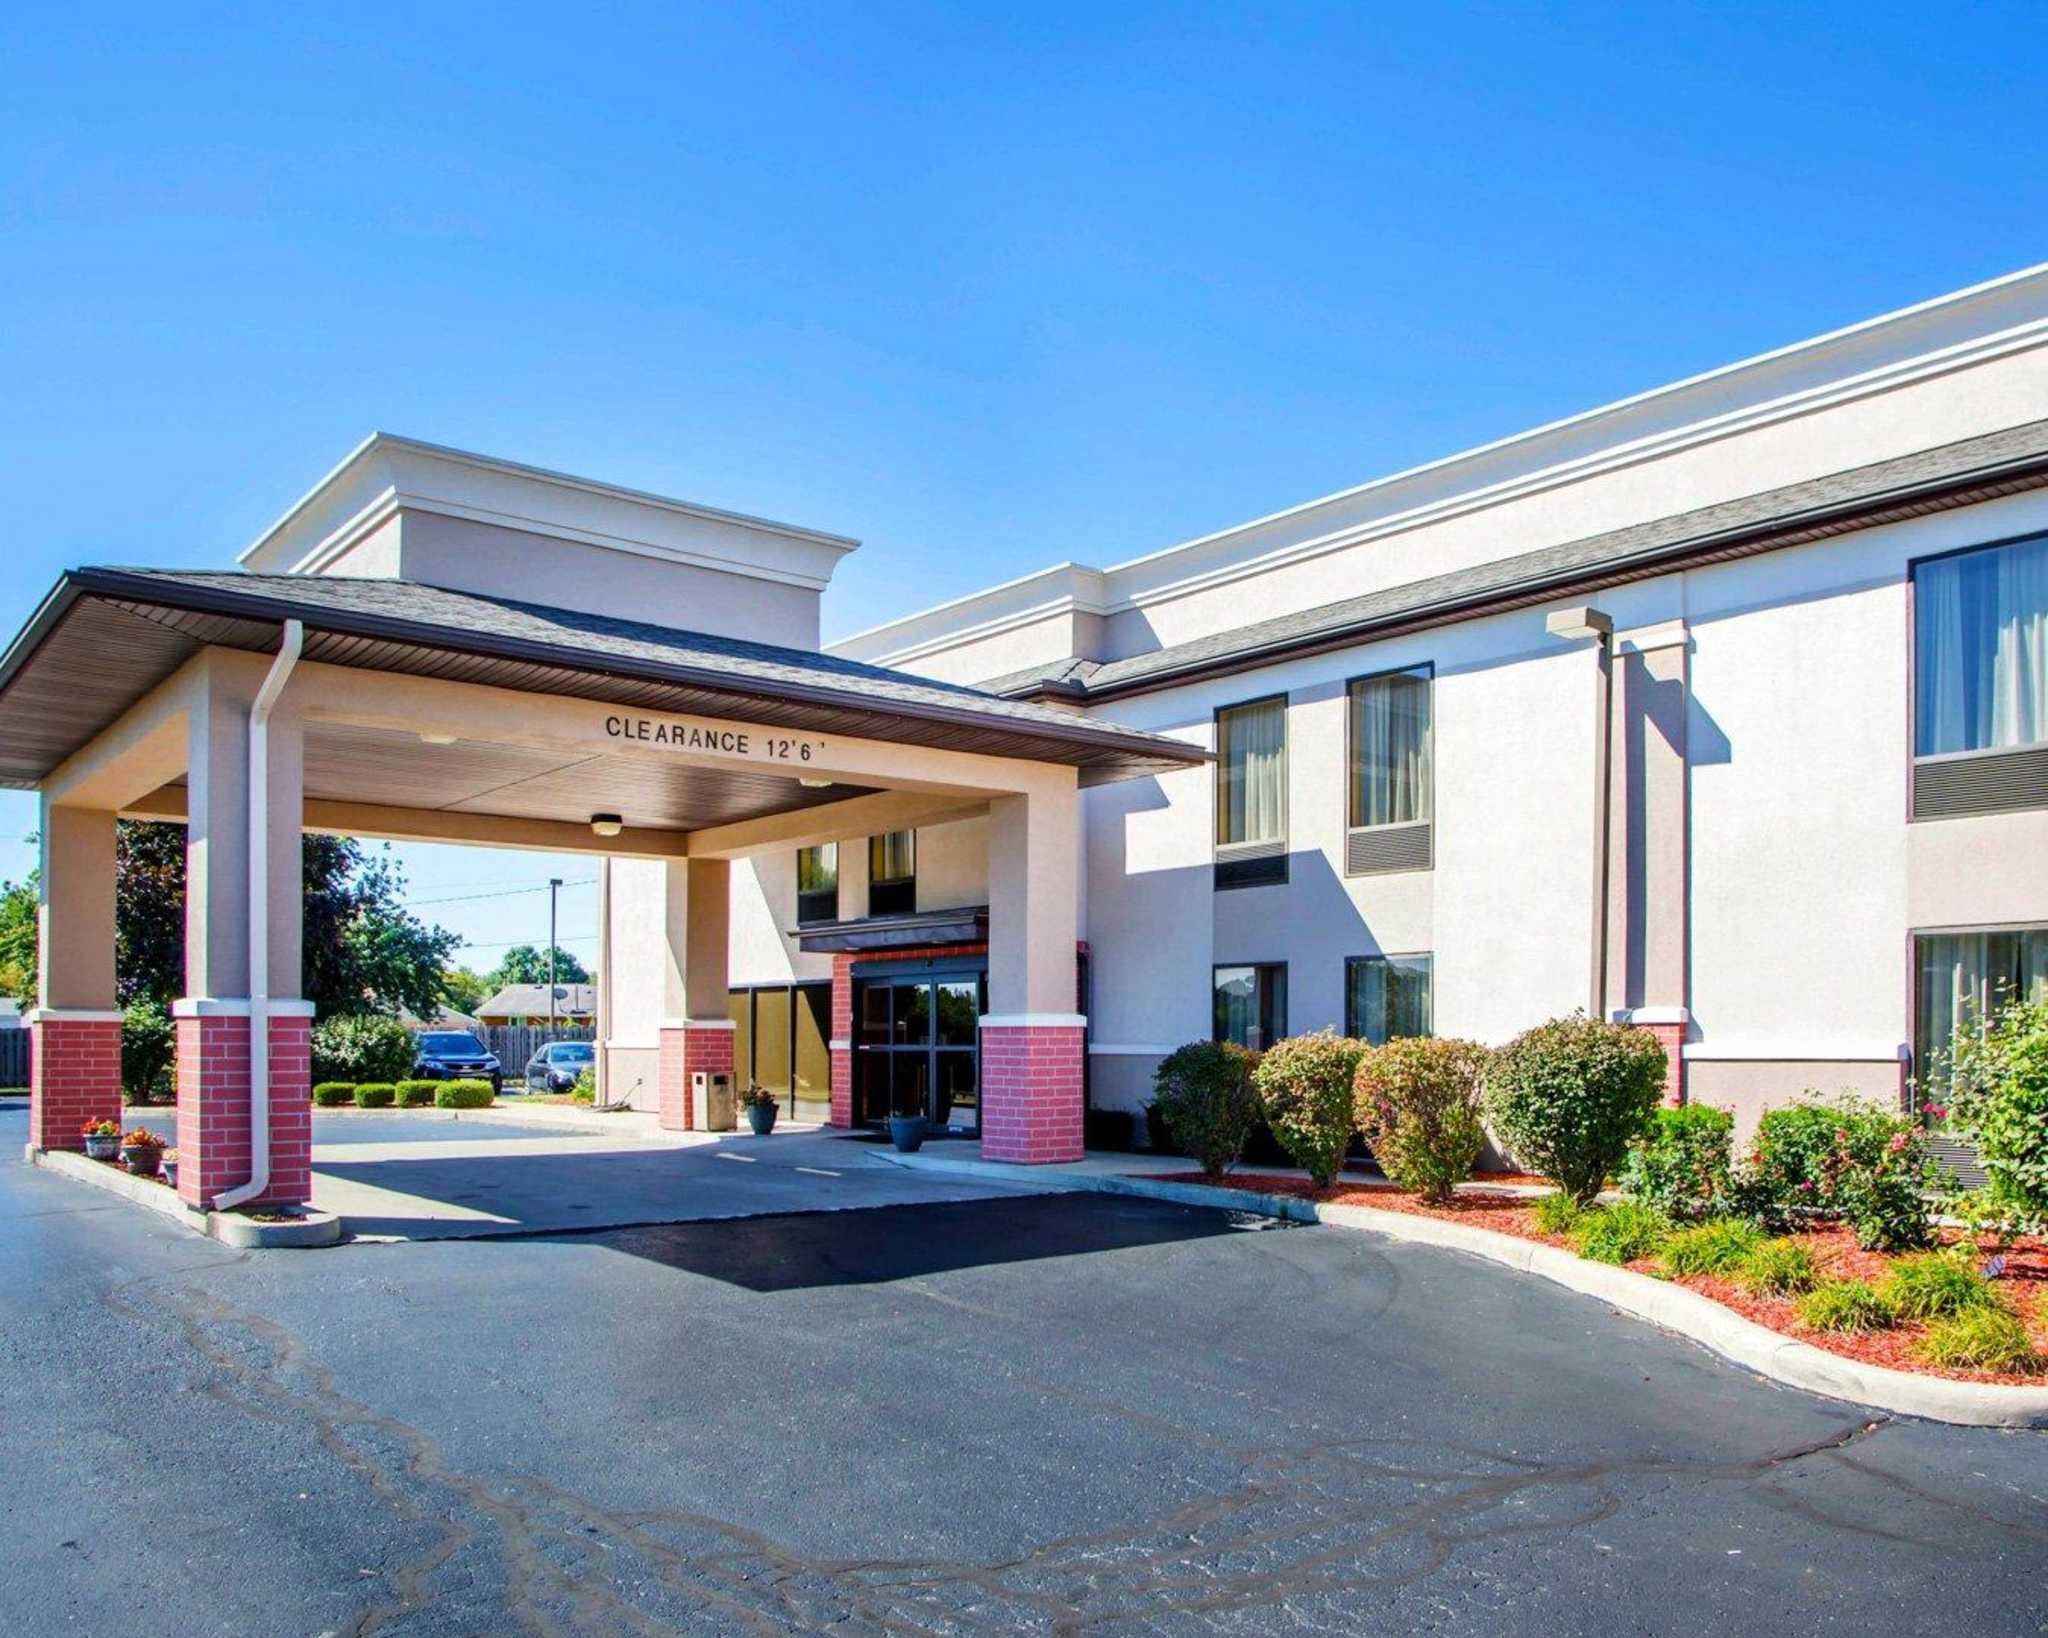 Comfort Inn Dayton - Huber Heights image 0